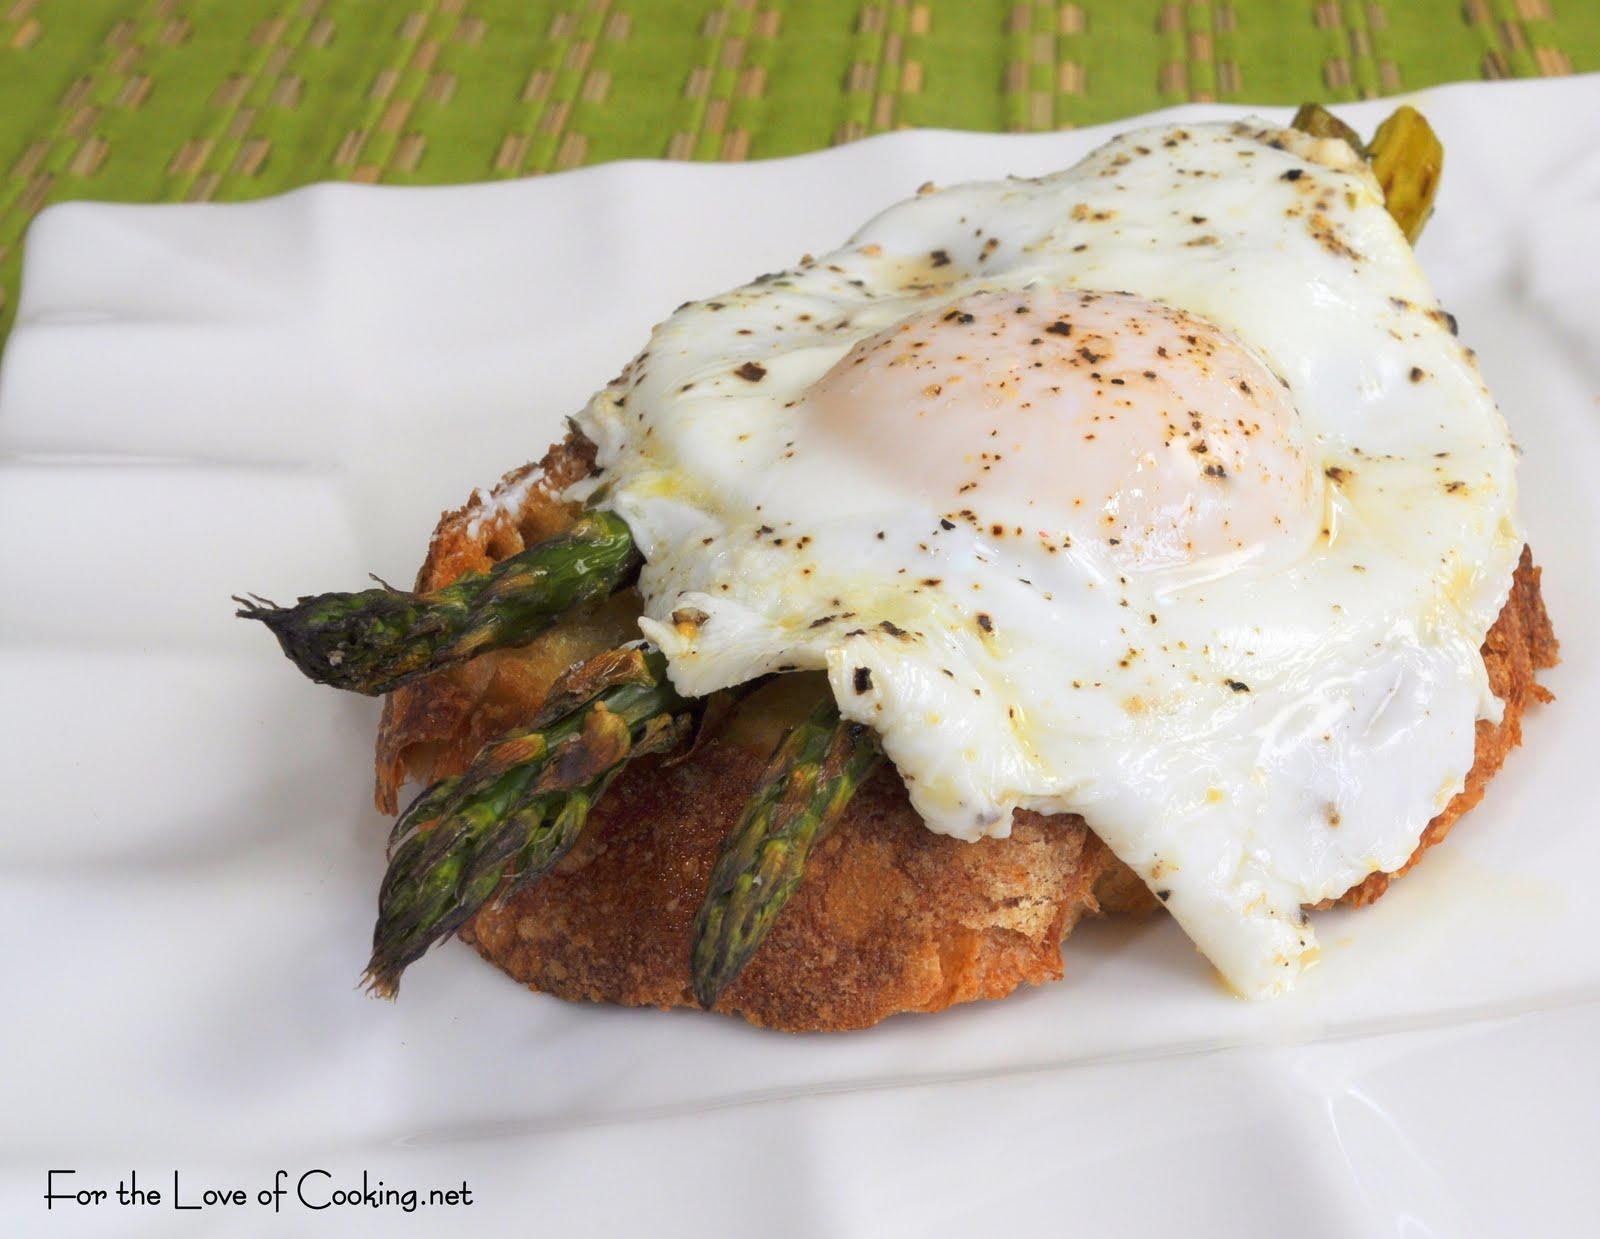 Roasted Asparagus and Steamed Egg on Toast